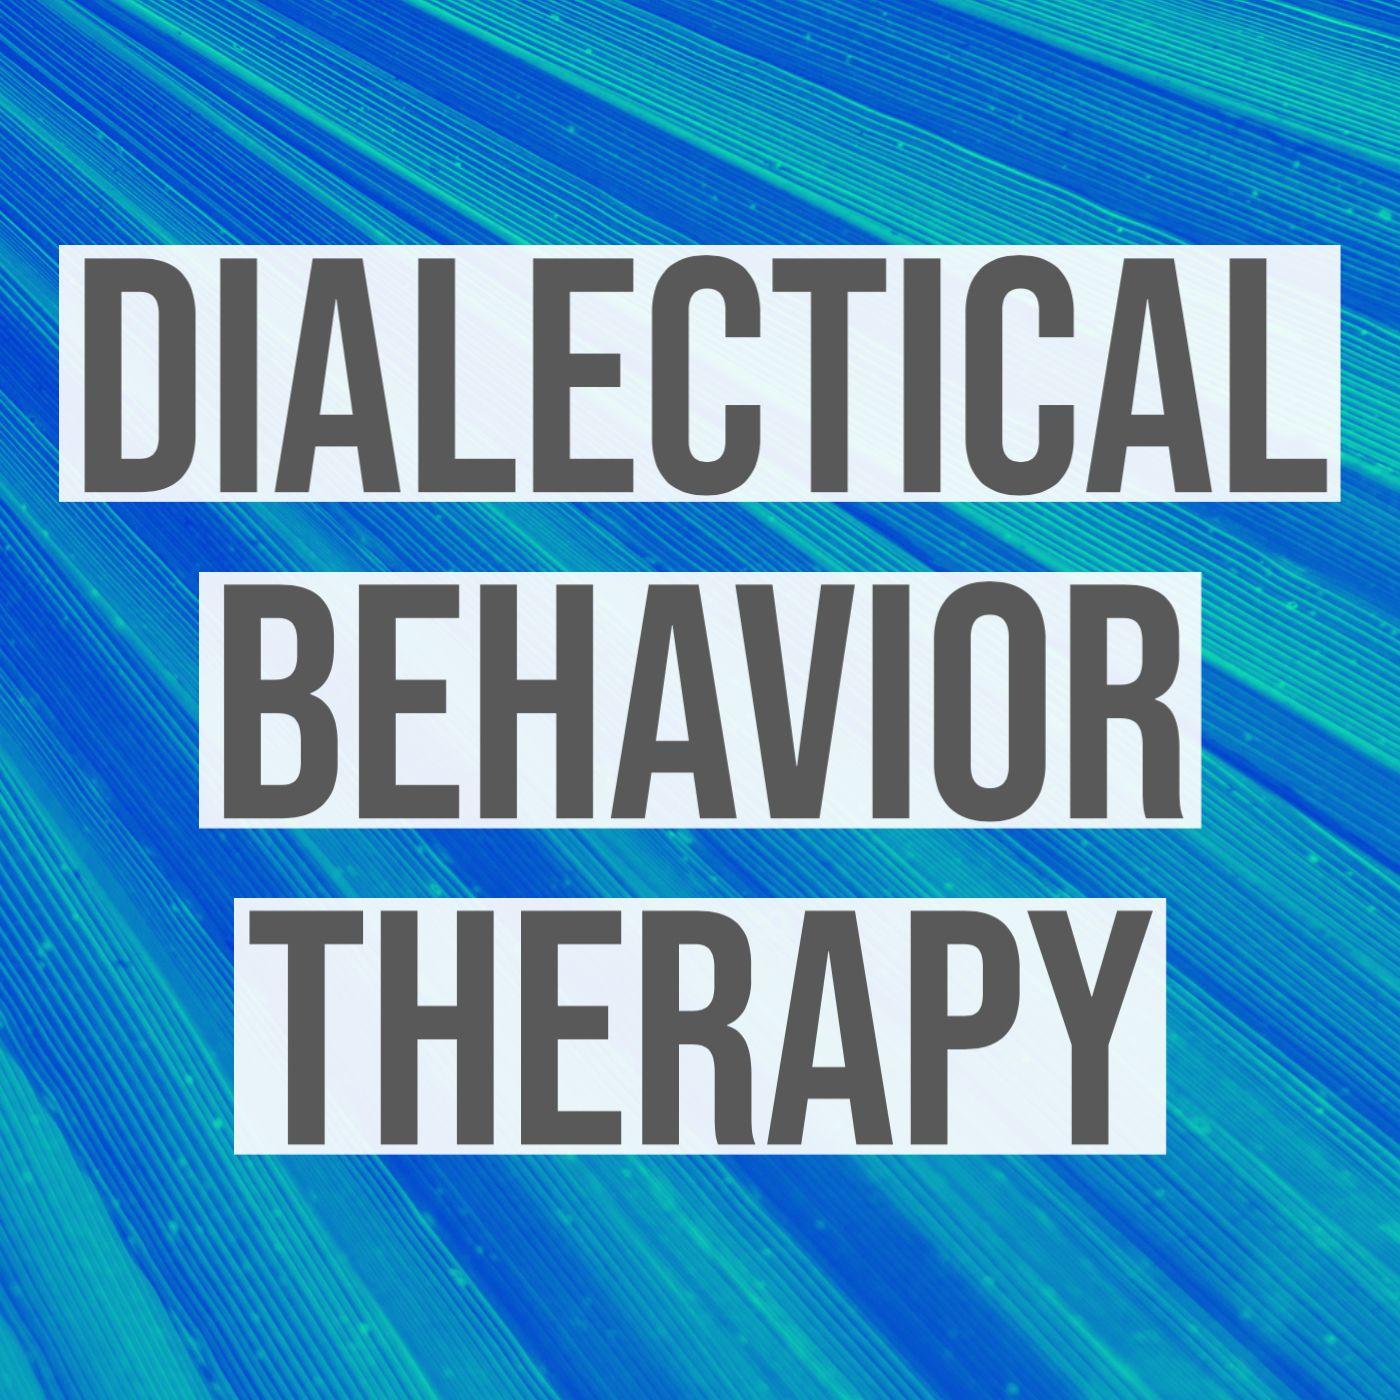 Dialectical Behavior Therapy (DBT) Technique (2019 Rerun)